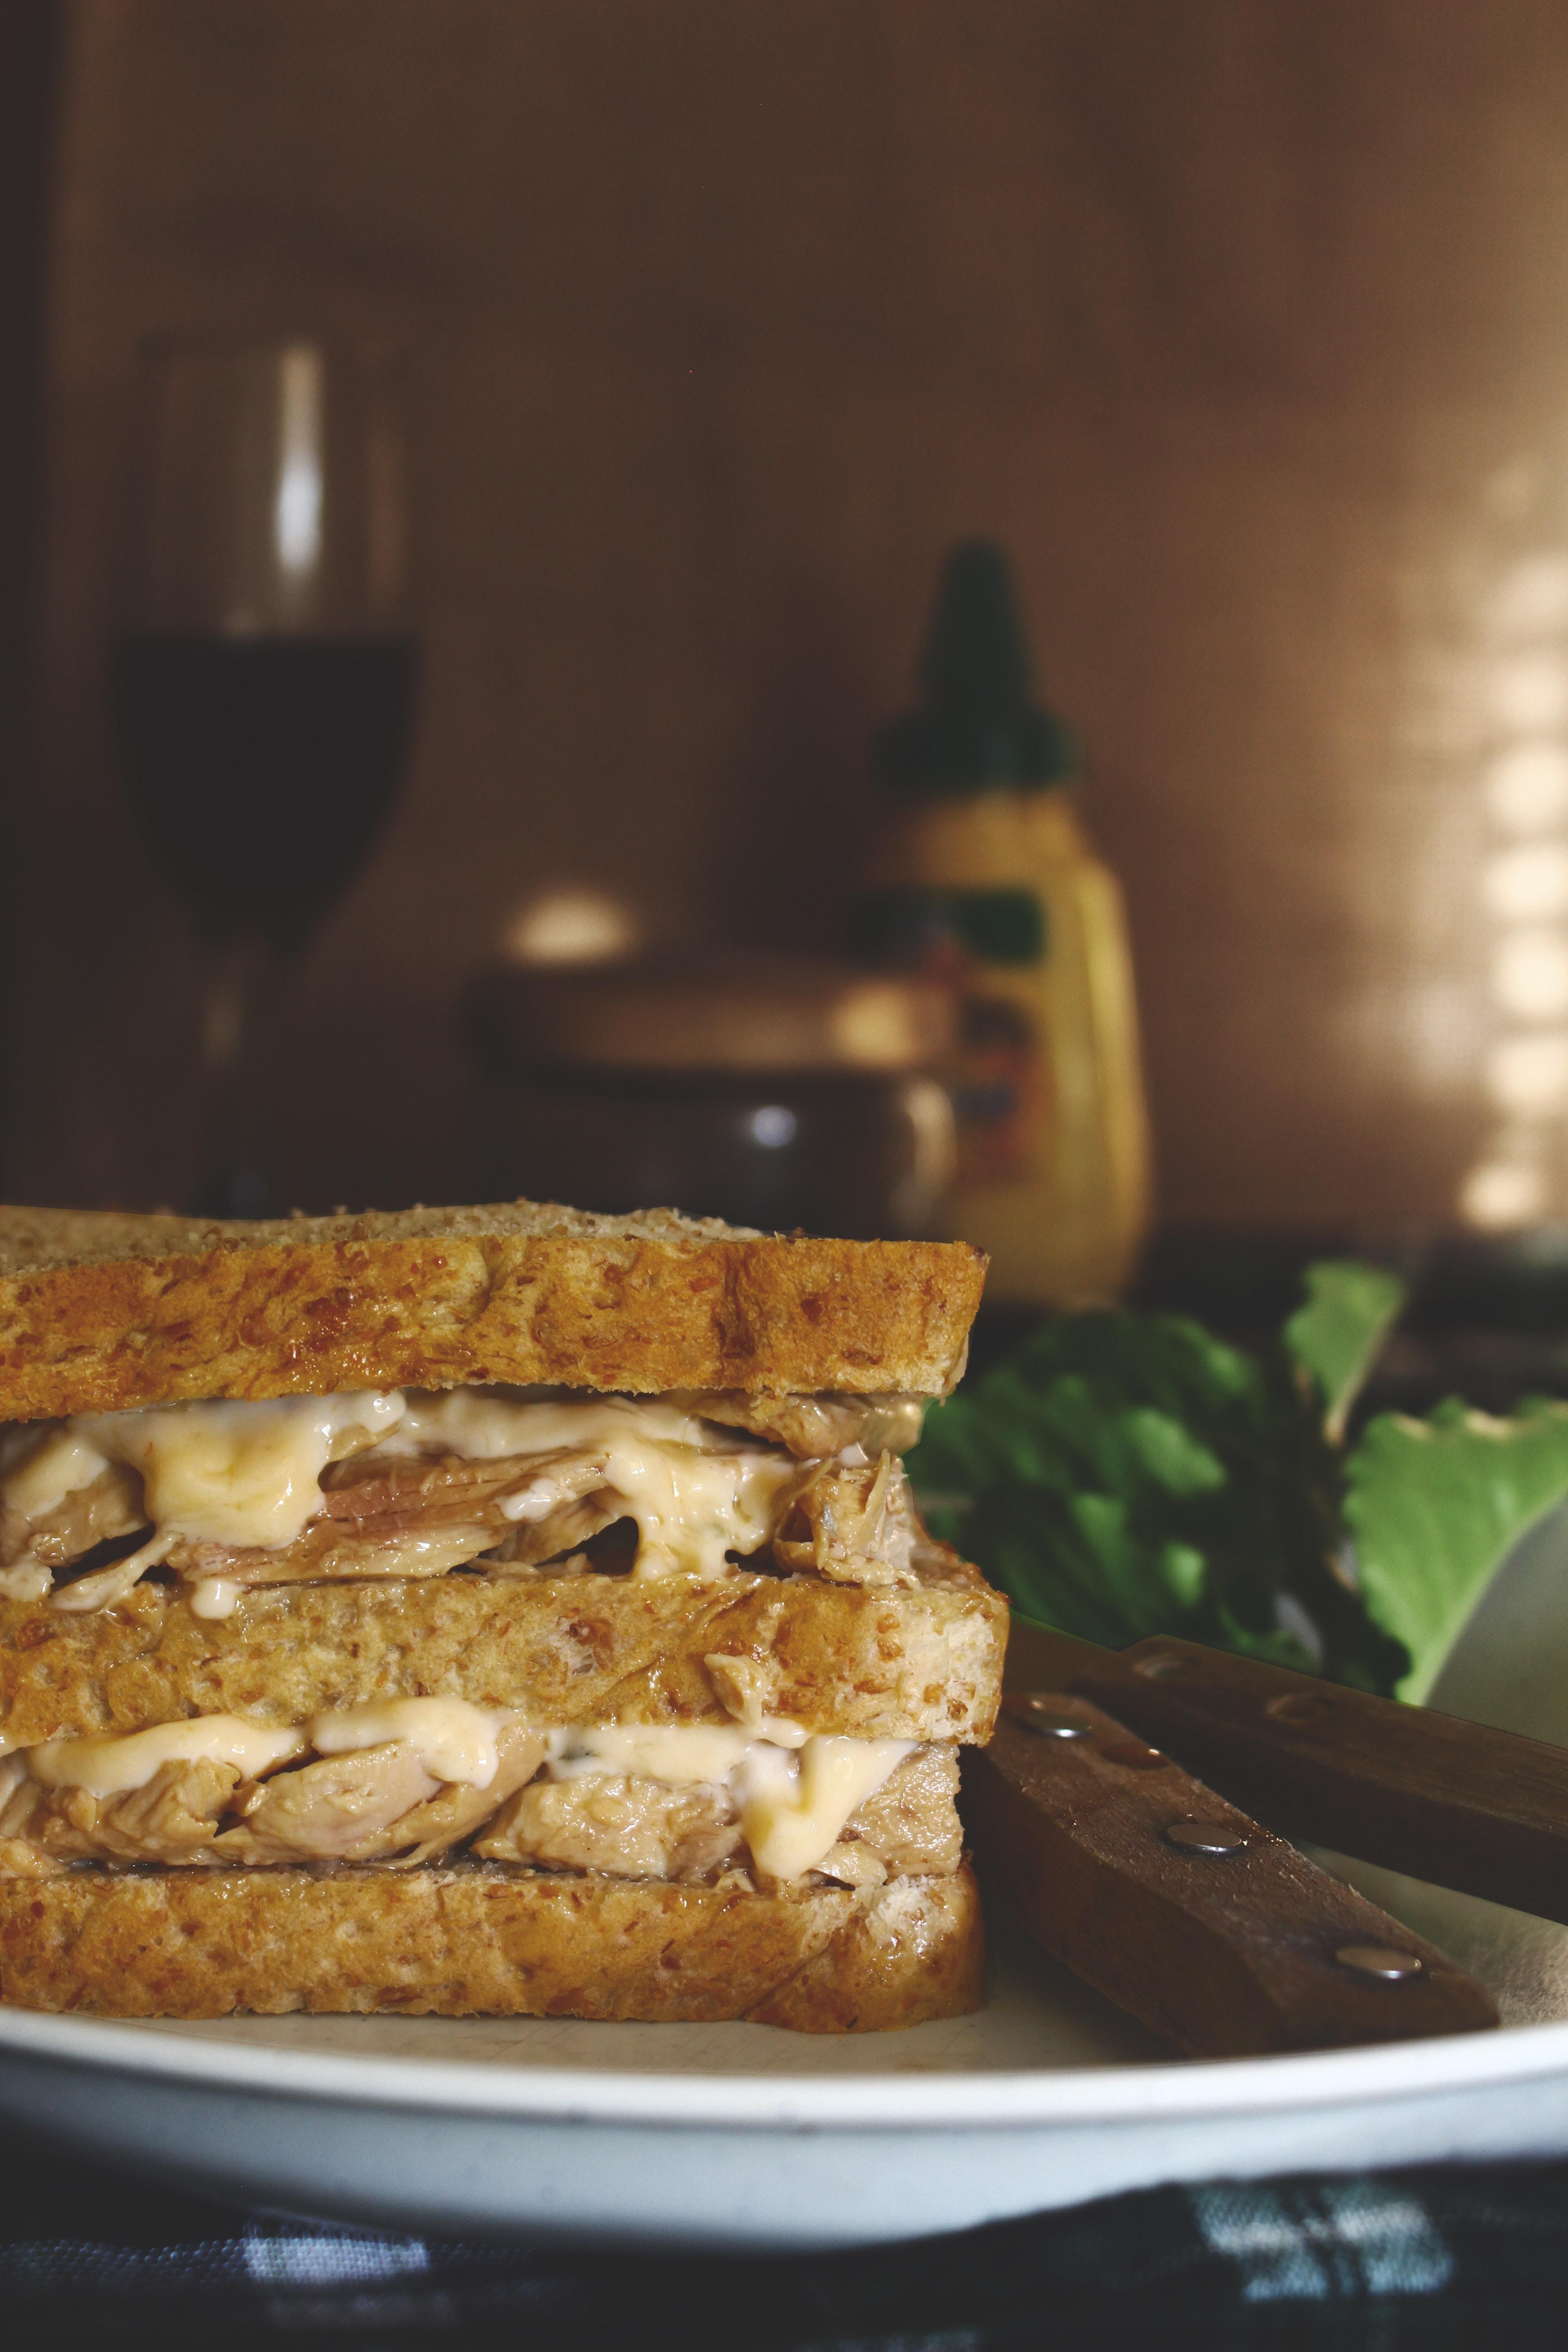 Baked sandwich photo